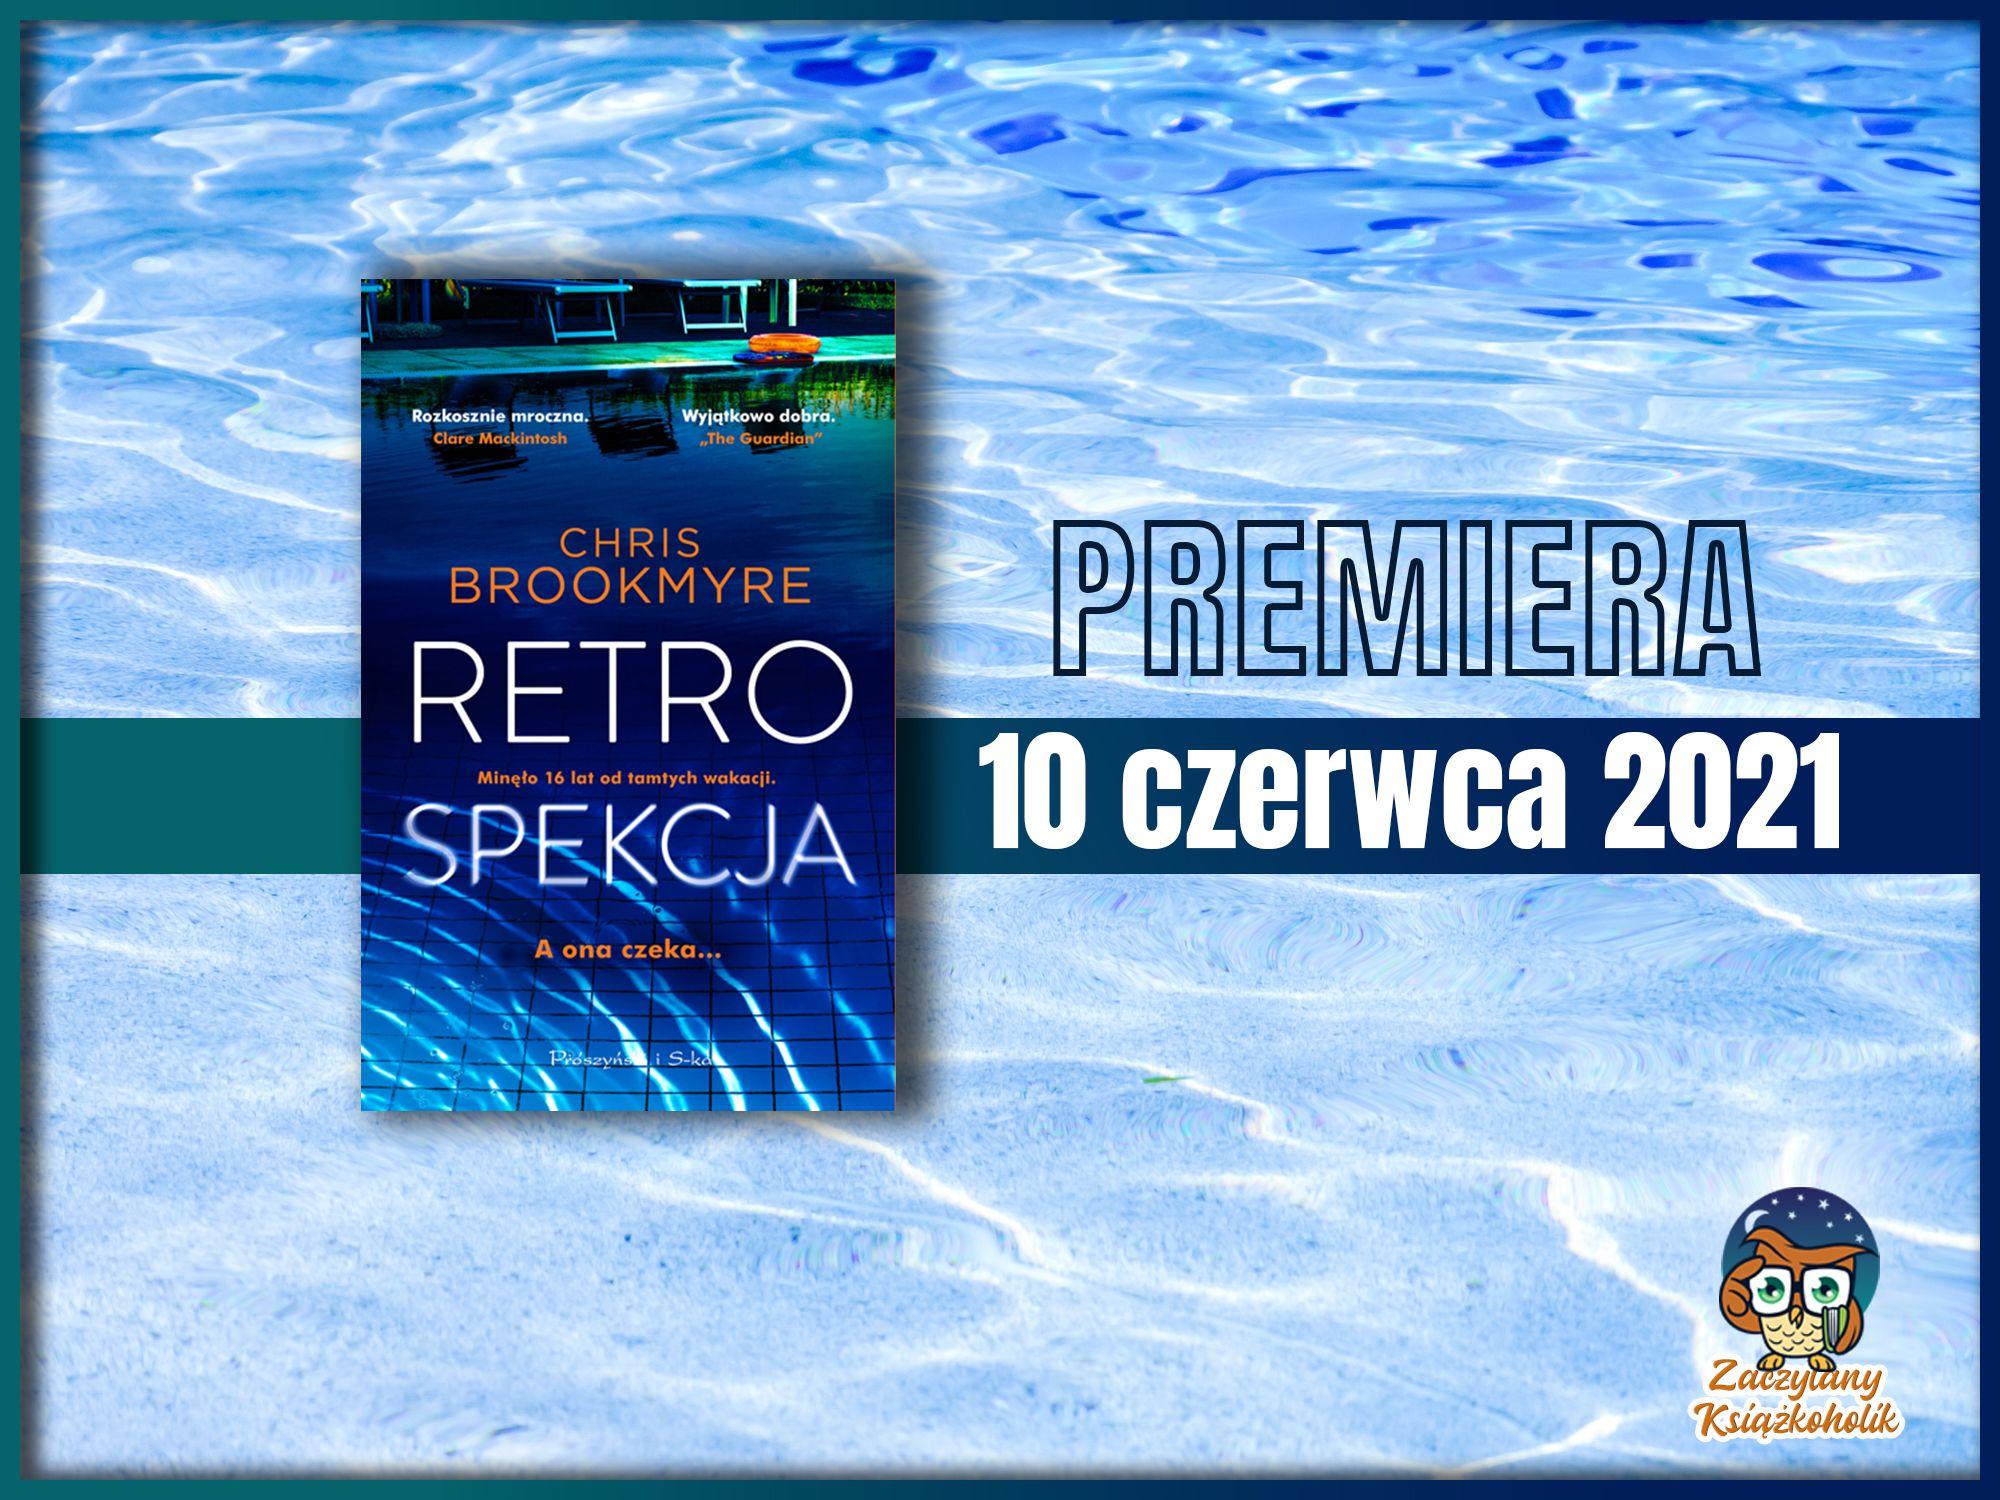 Retrospekcja, Chris Brookmyre, zaczytanyksiazkoholik.pl